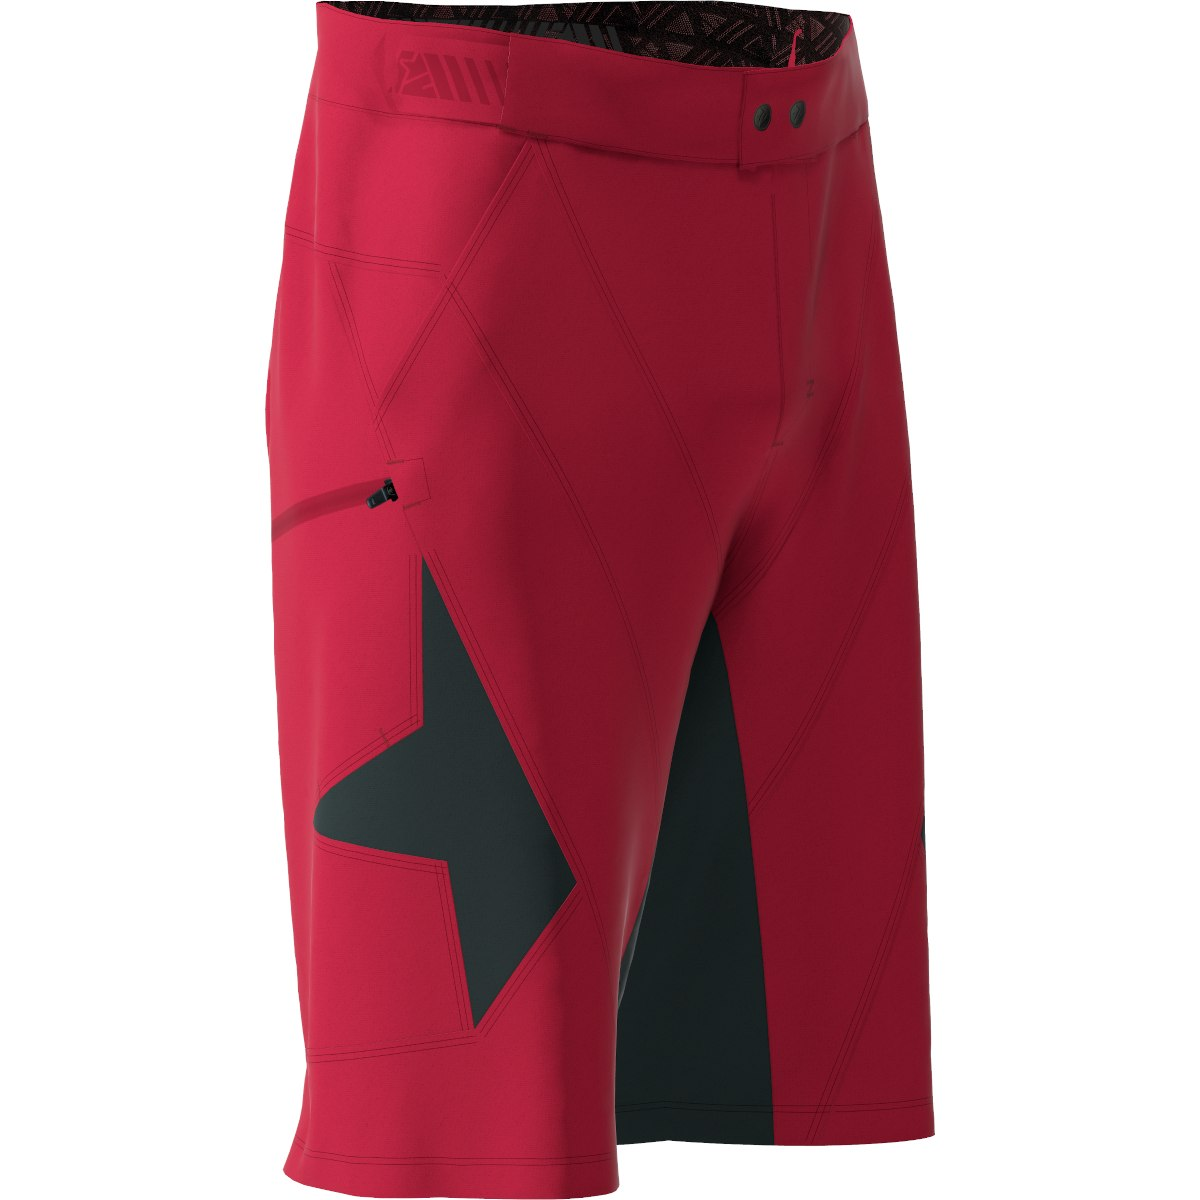 Image of Zimtstern Tauruz Evo MTB-Shorts - jester red/pirate black